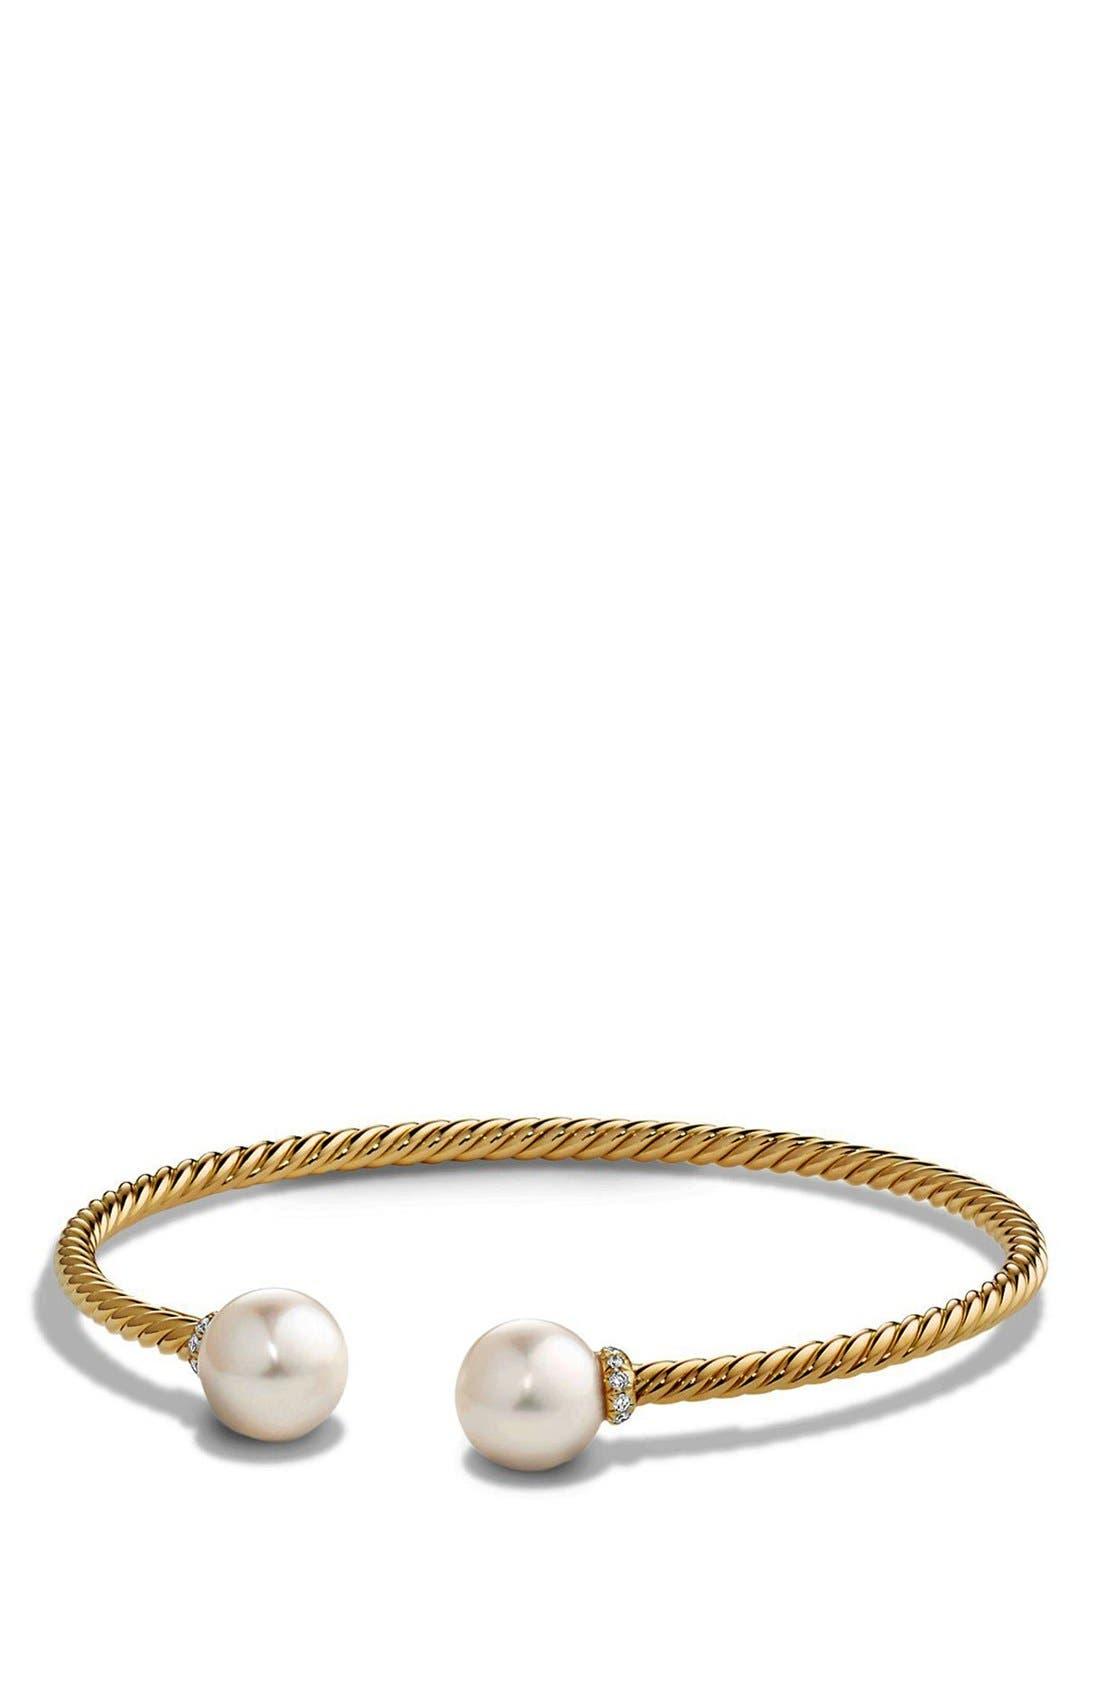 Main Image - David Yurman 'Solari' Bead Bracelet with Diamonds and Pearls in 18K Gold